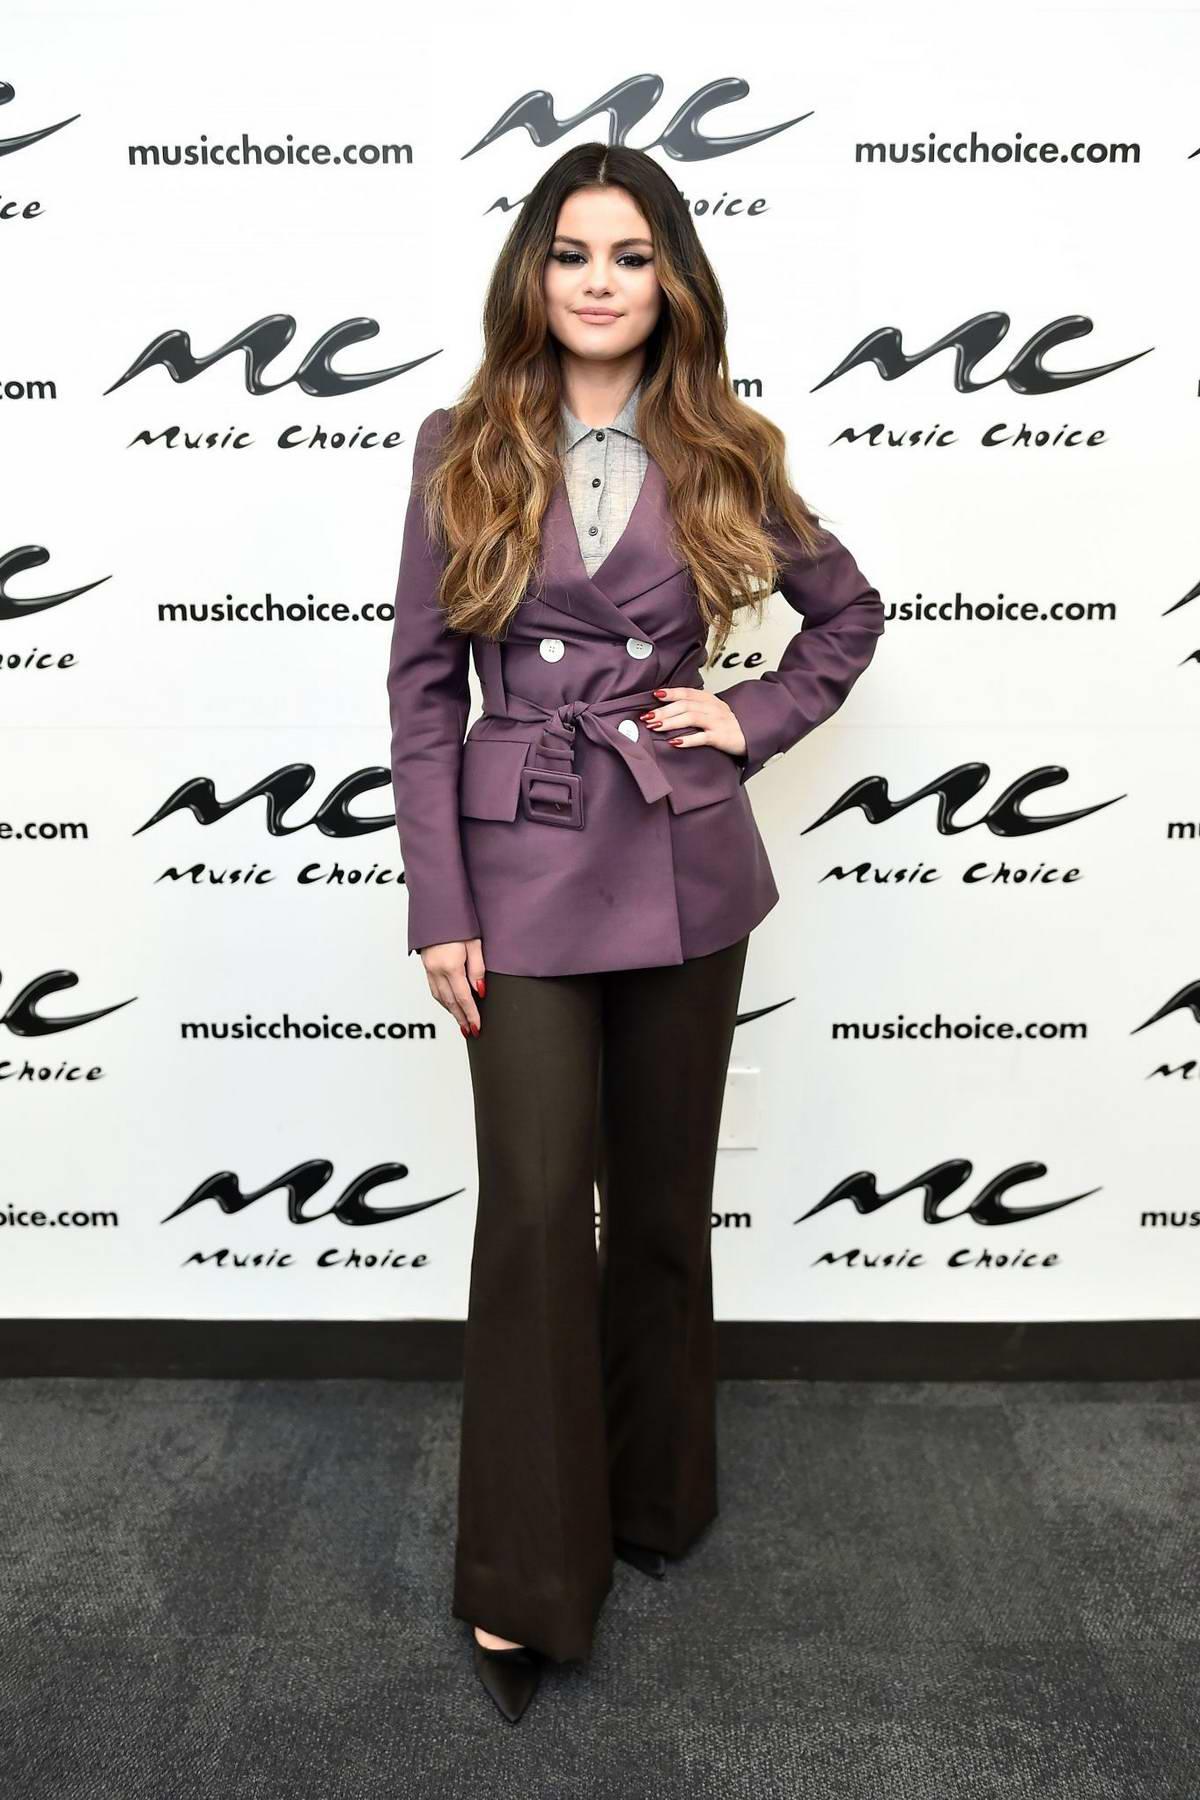 Selena Gomez visits Music Choice in New York City